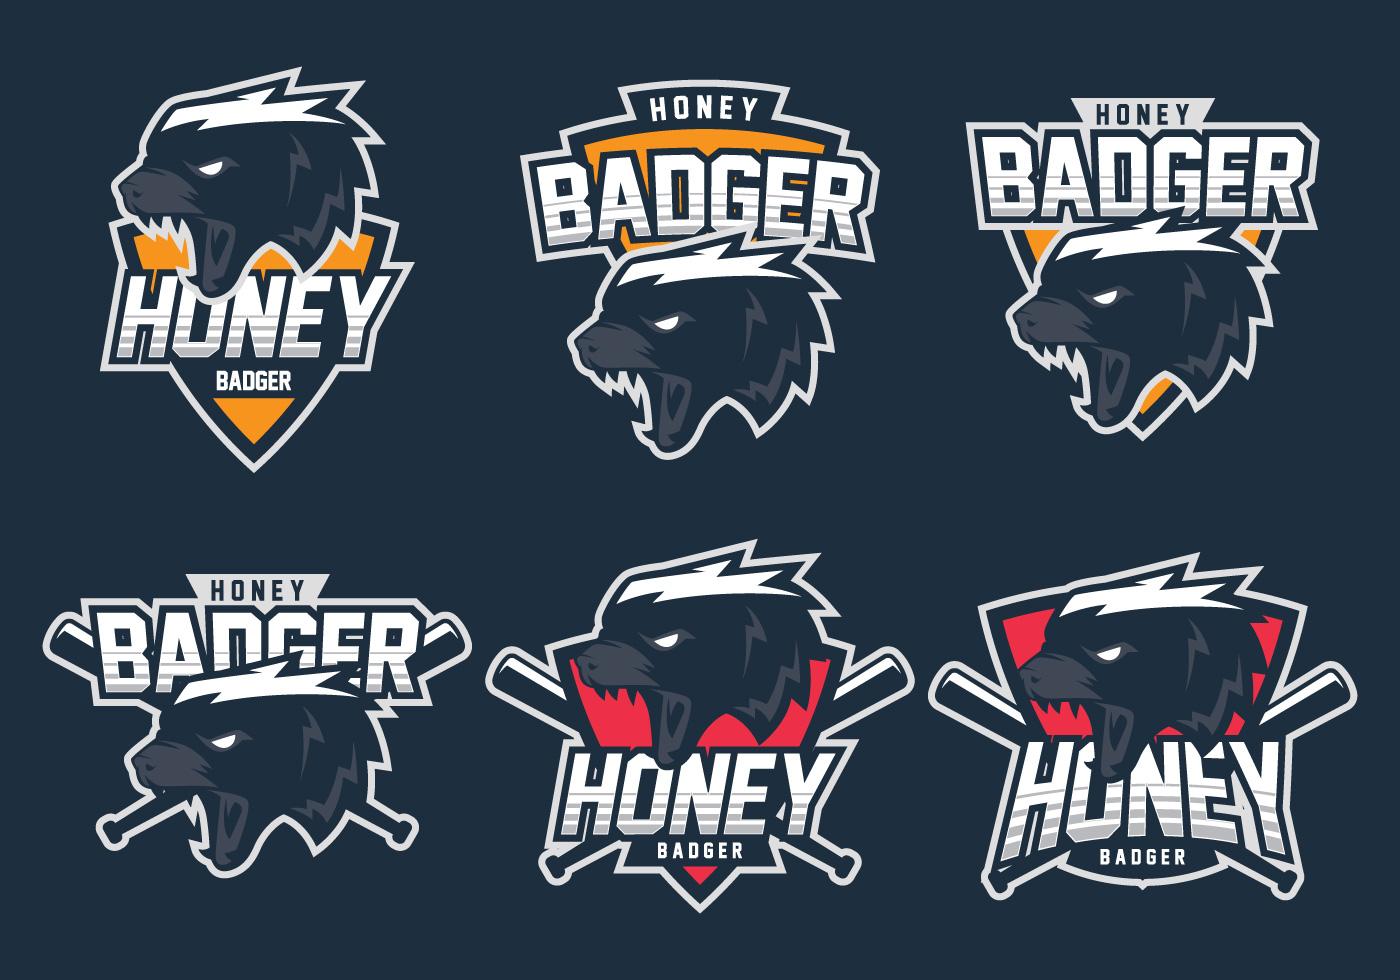 Badger mascot clipart banner royalty free Mascot Free Vector Art - (77,946 Free Downloads) banner royalty free